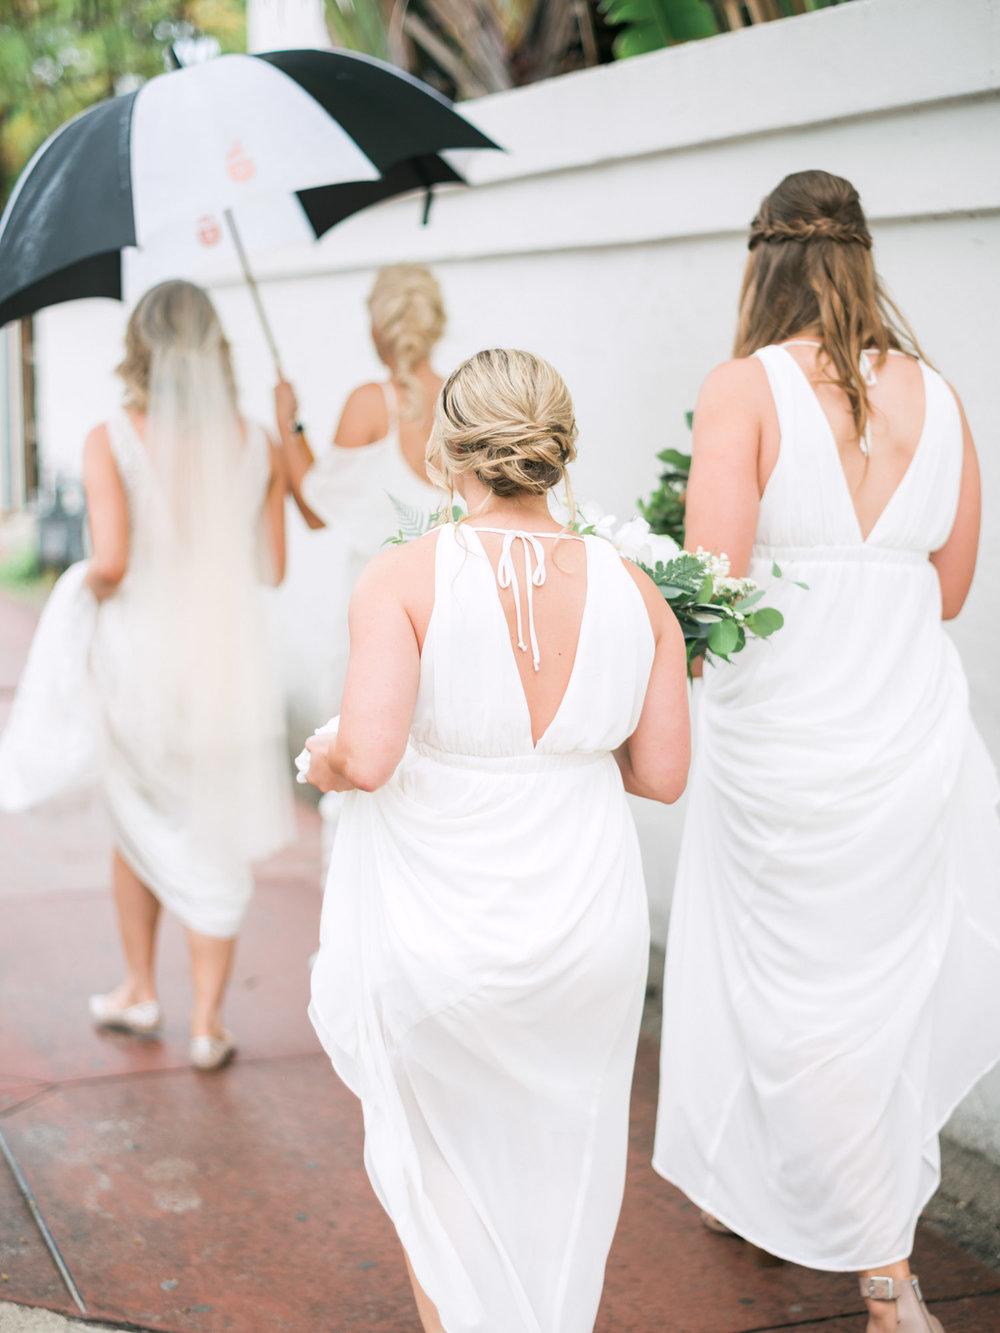 raleigh-miami-beach-destination-film-wedding-0727.jpg